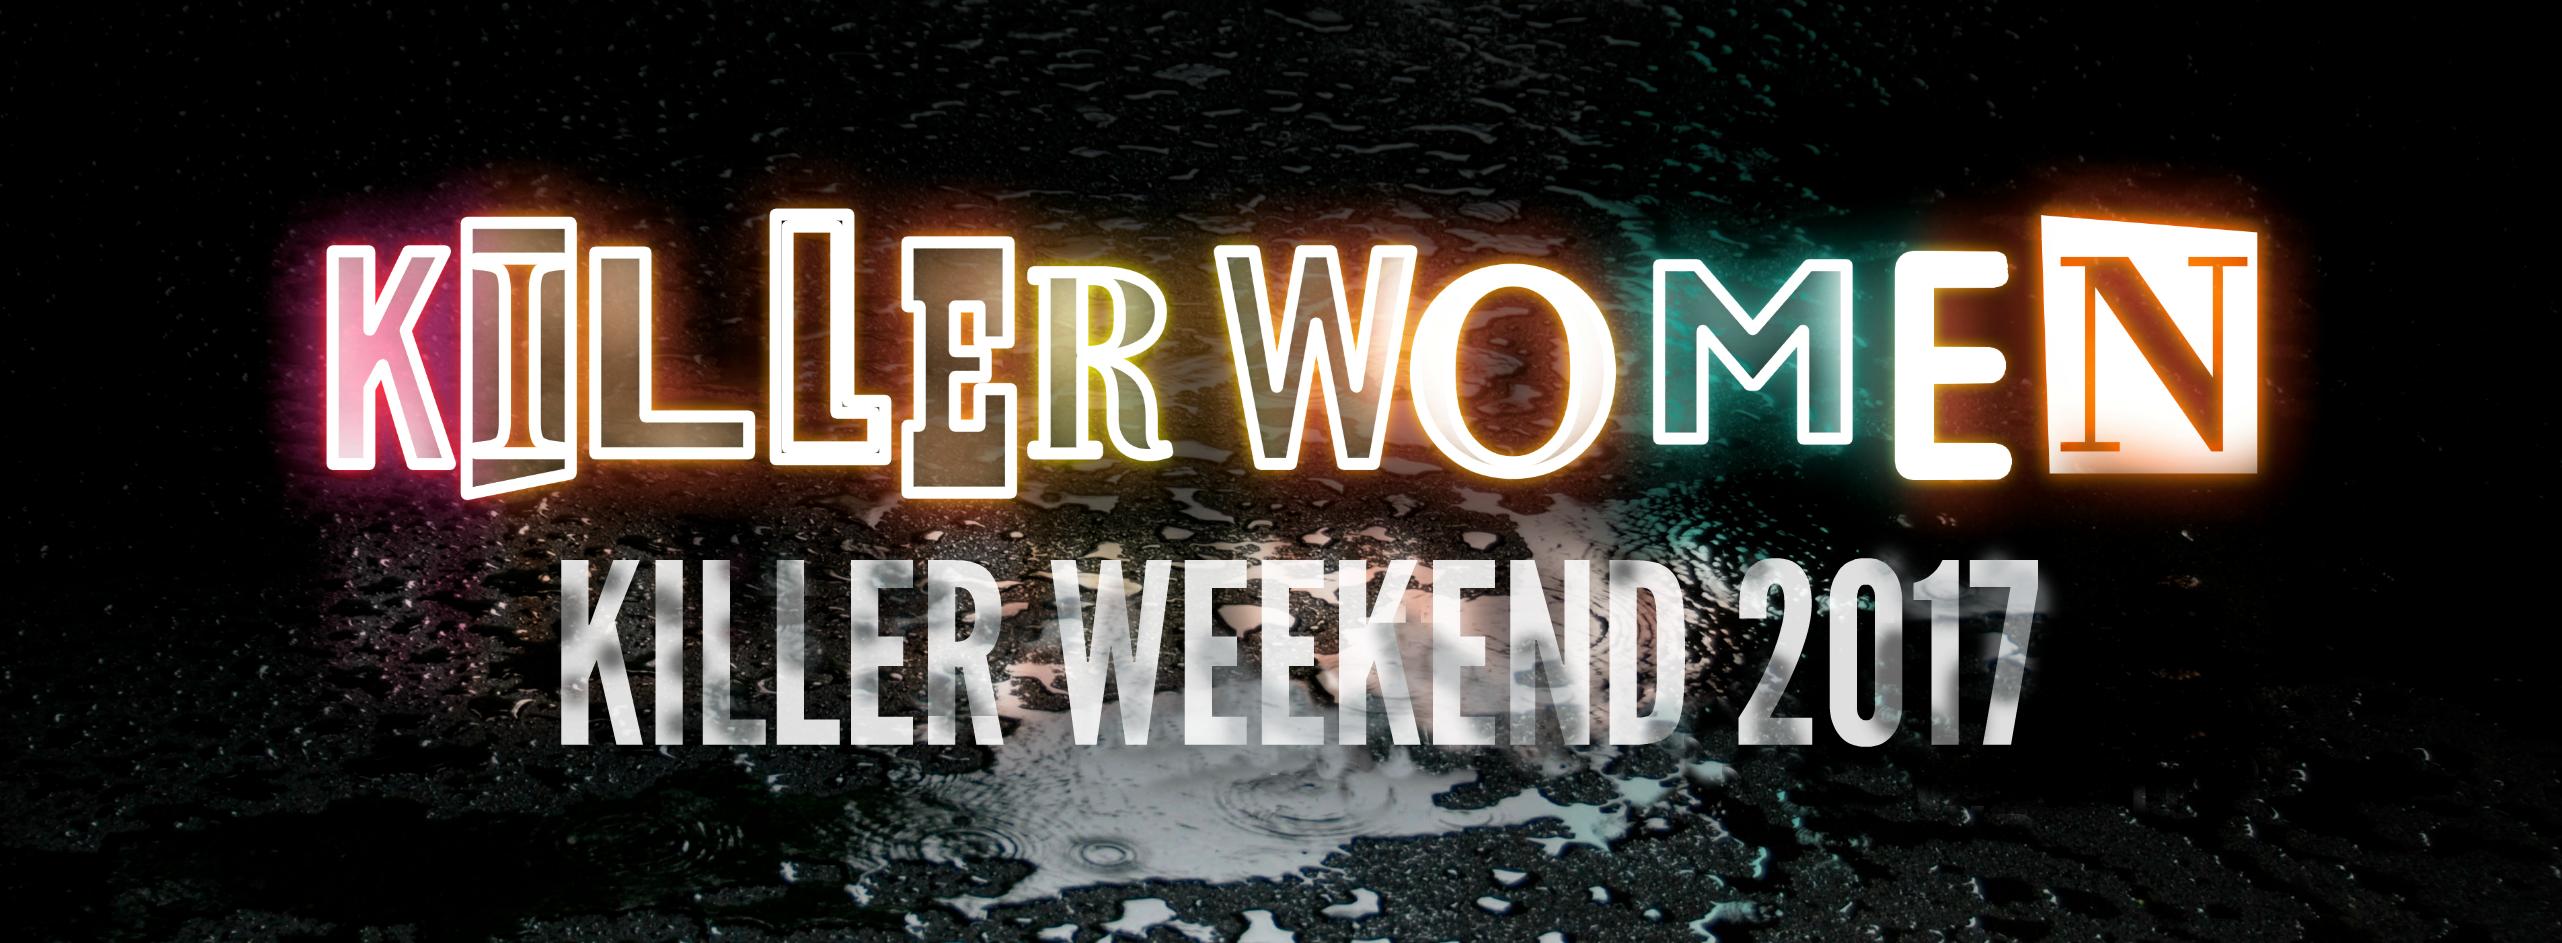 Second Killer Women Weekend